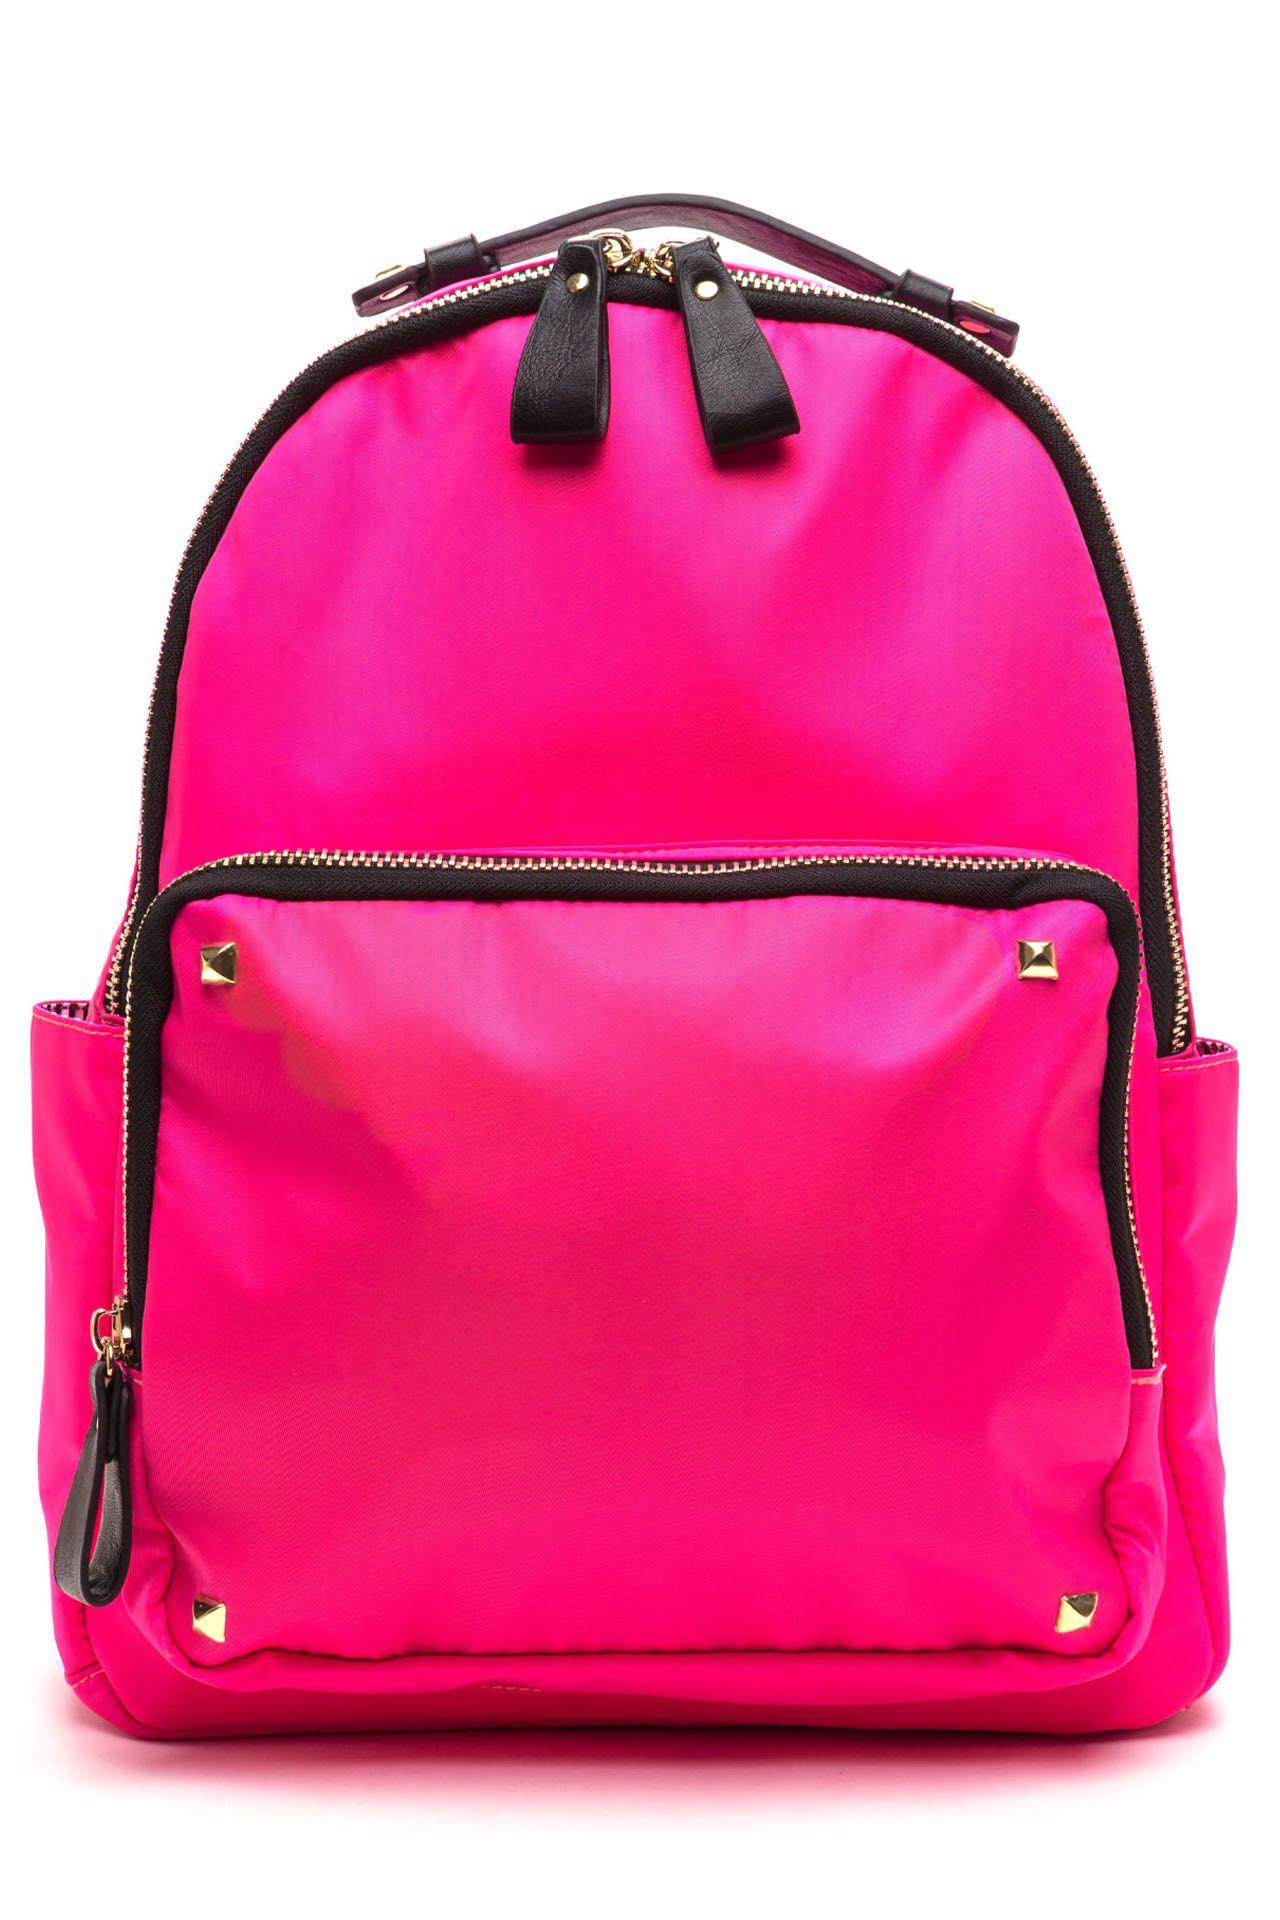 7442f5435de Neon Stylish Backpacks, Cute Backpacks, Fashion Backpack, Cute School Bags,  Back To